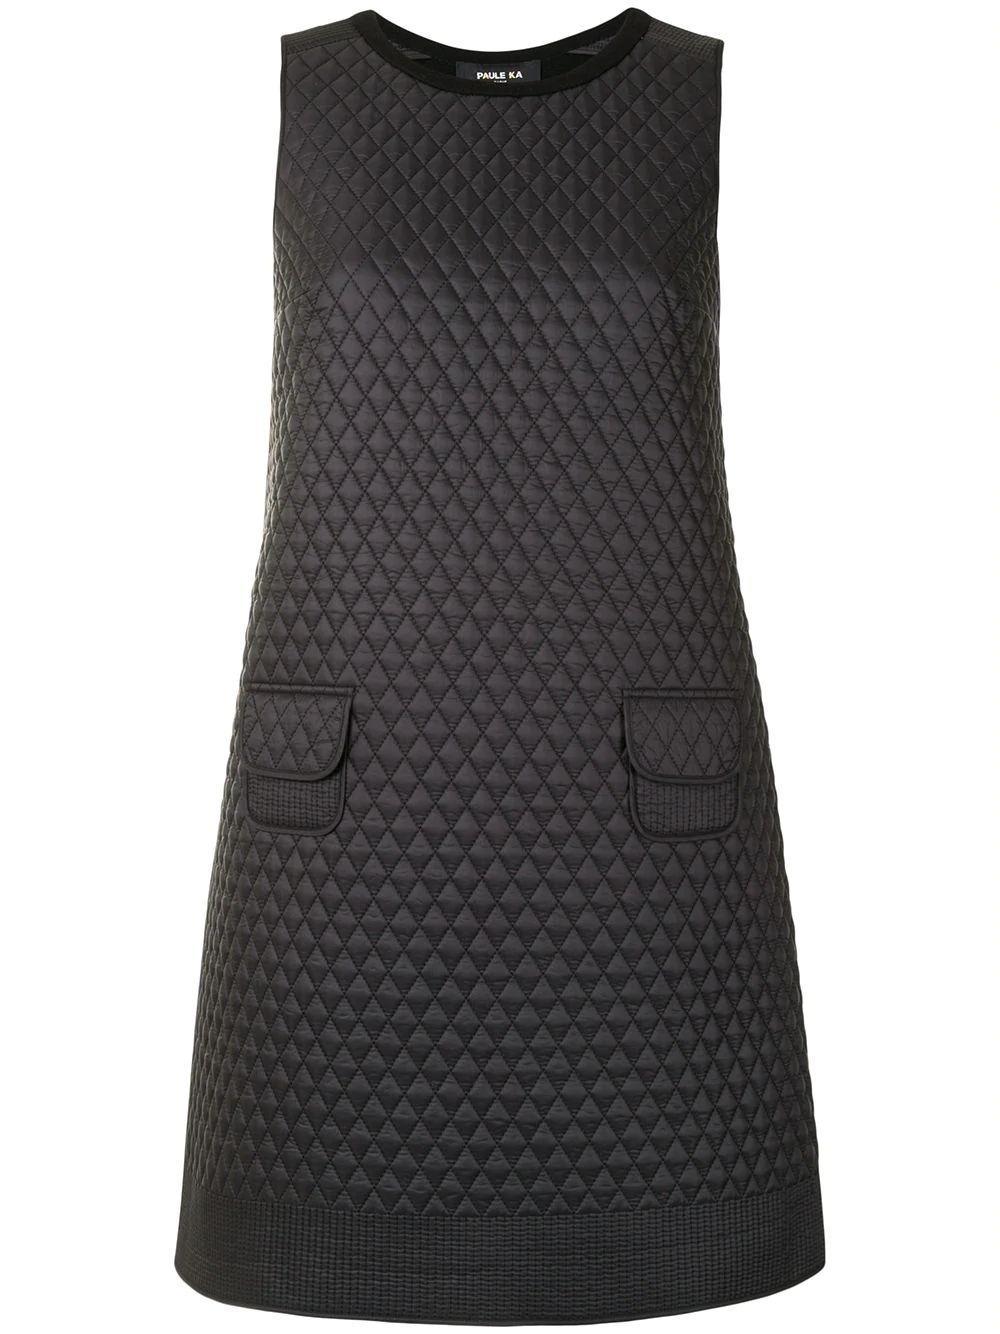 Quilted Mini Dress Item # 166/R062